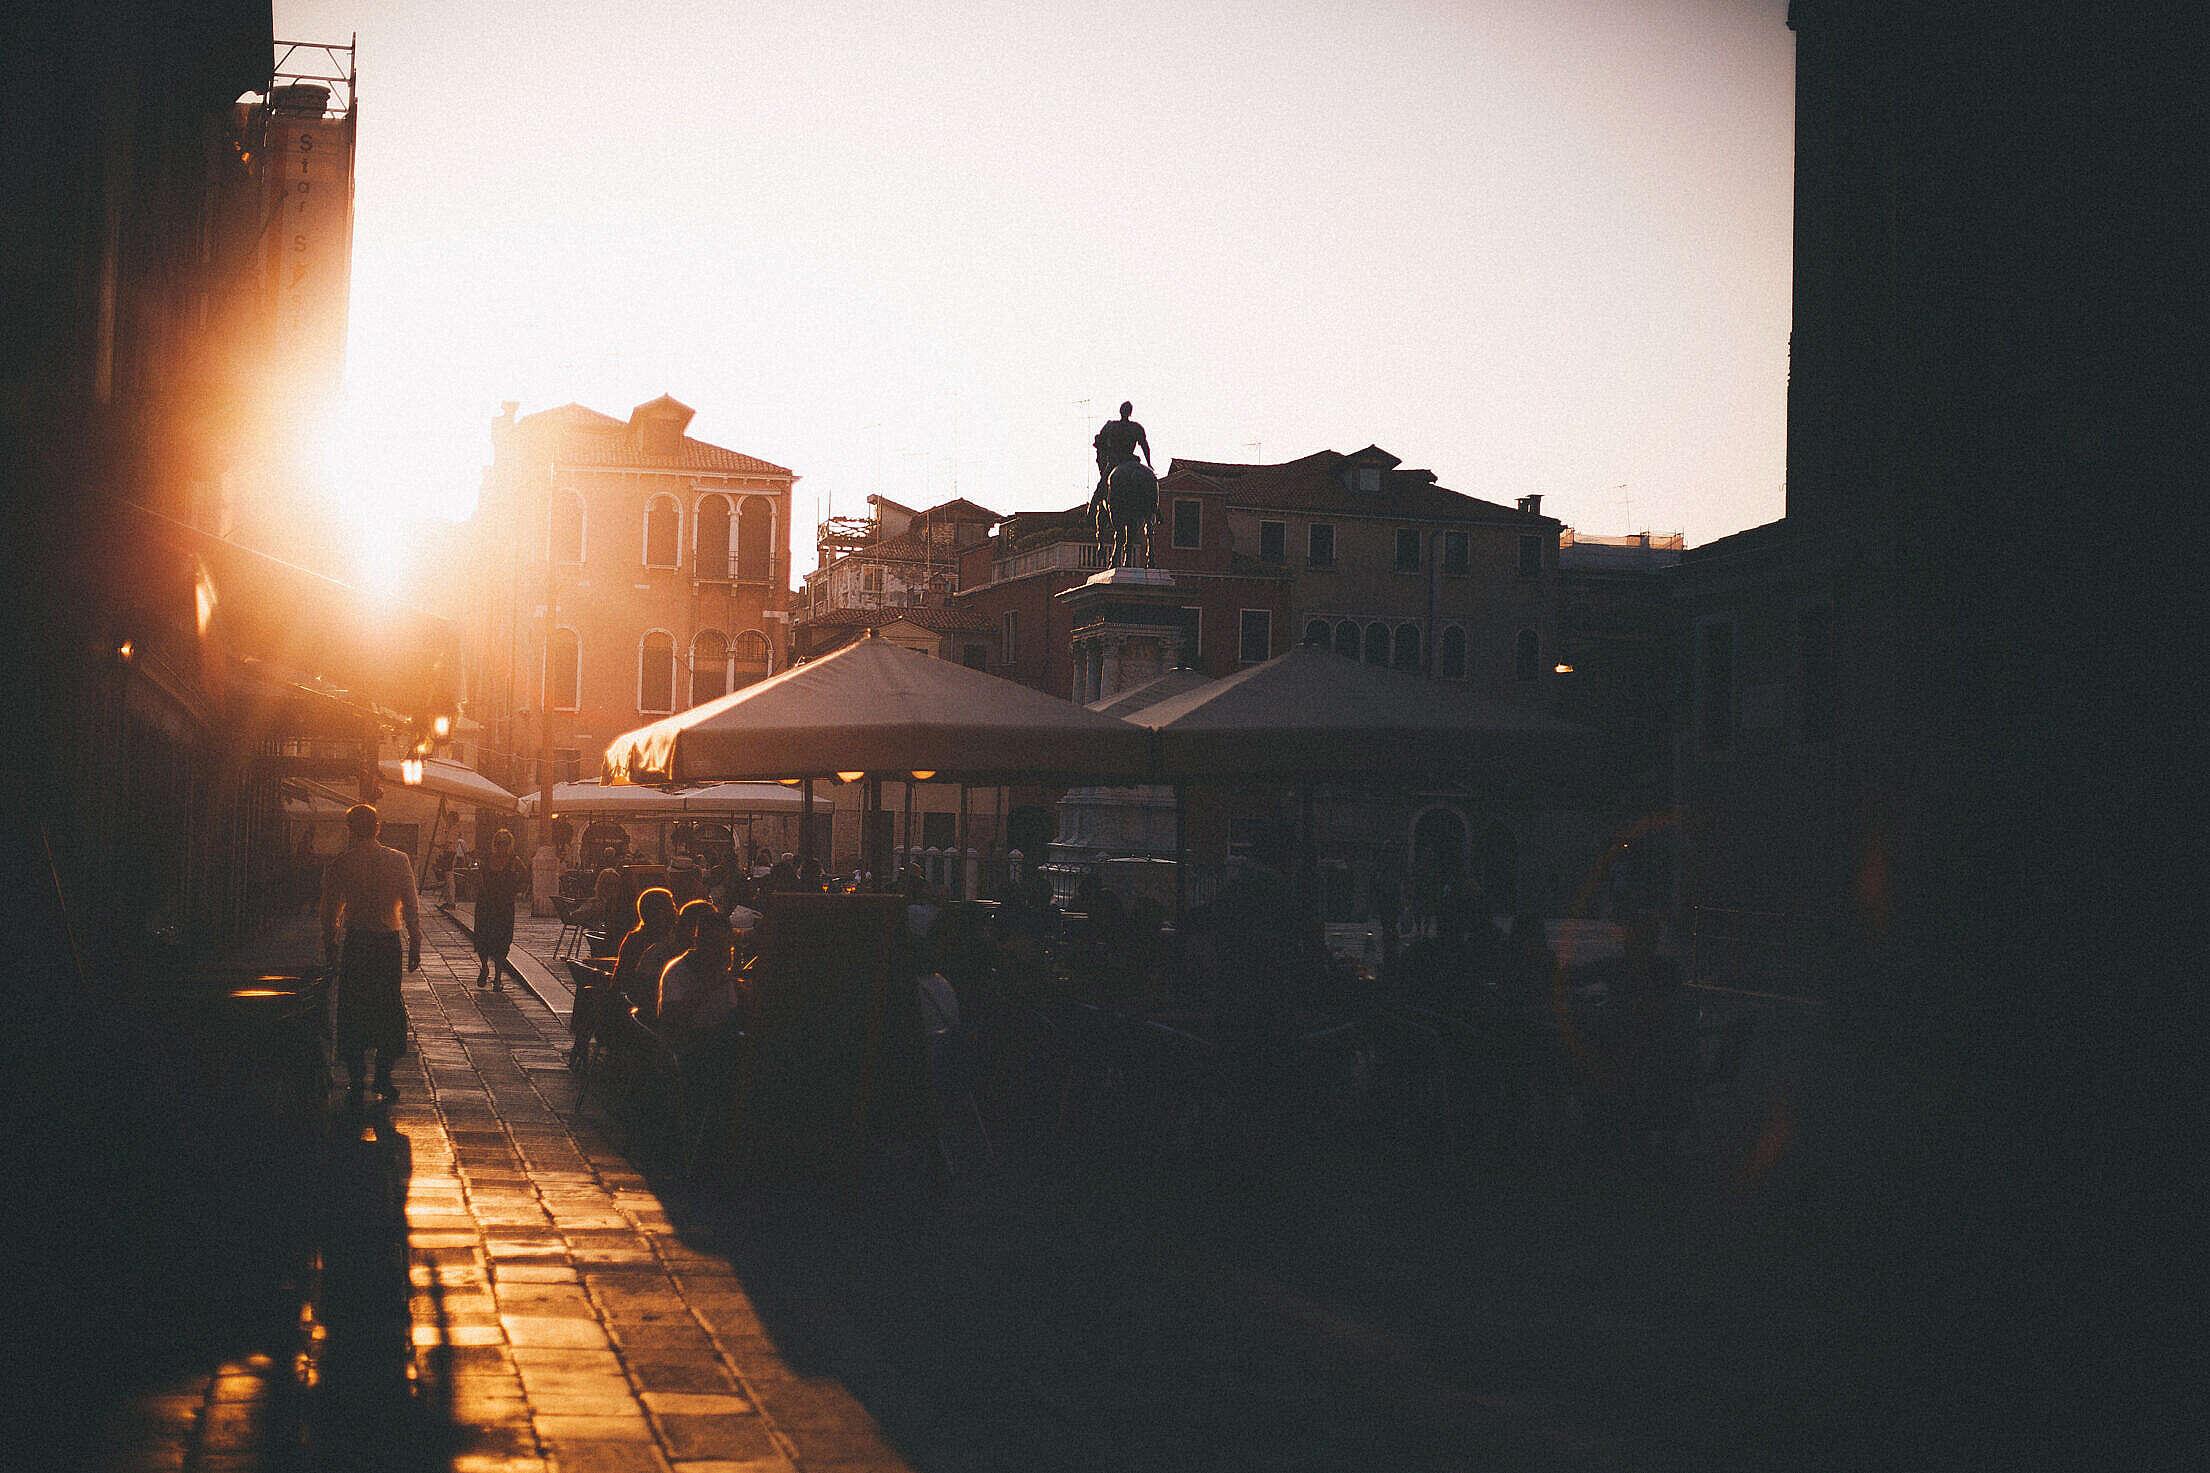 Random Square in Venice, Italy Free Stock Photo